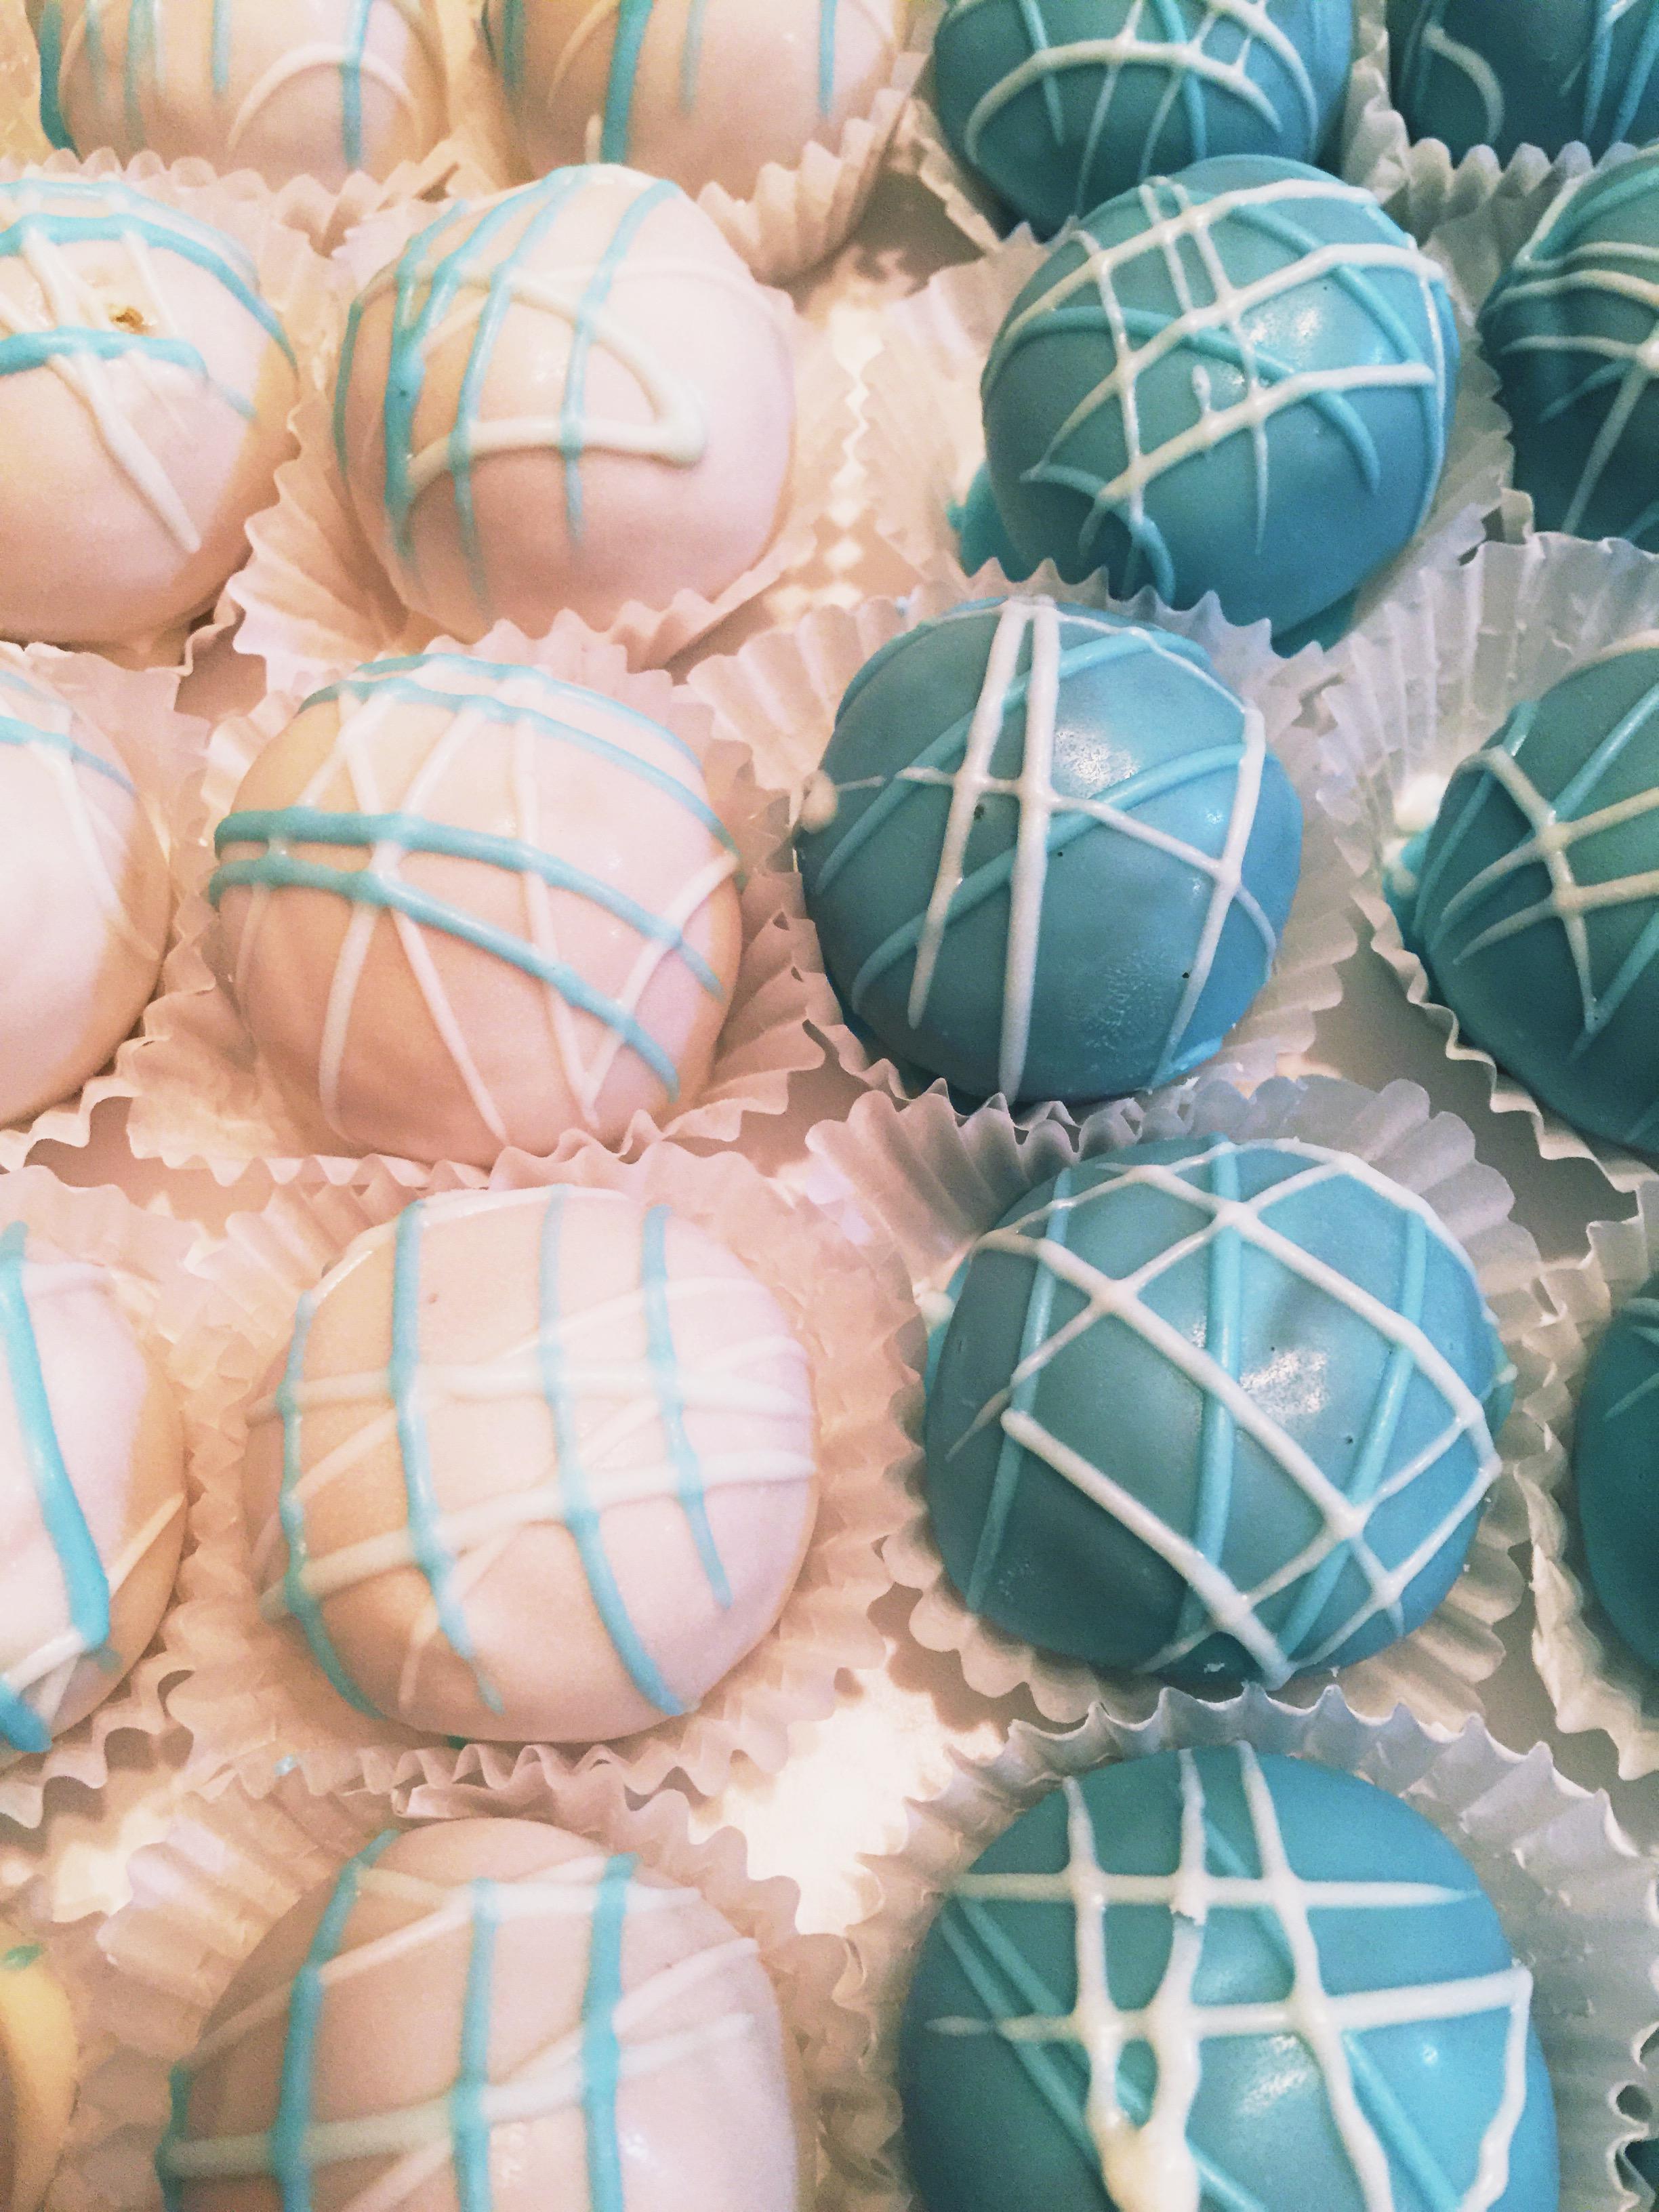 Cincinnati Baby Shower Cake Balls